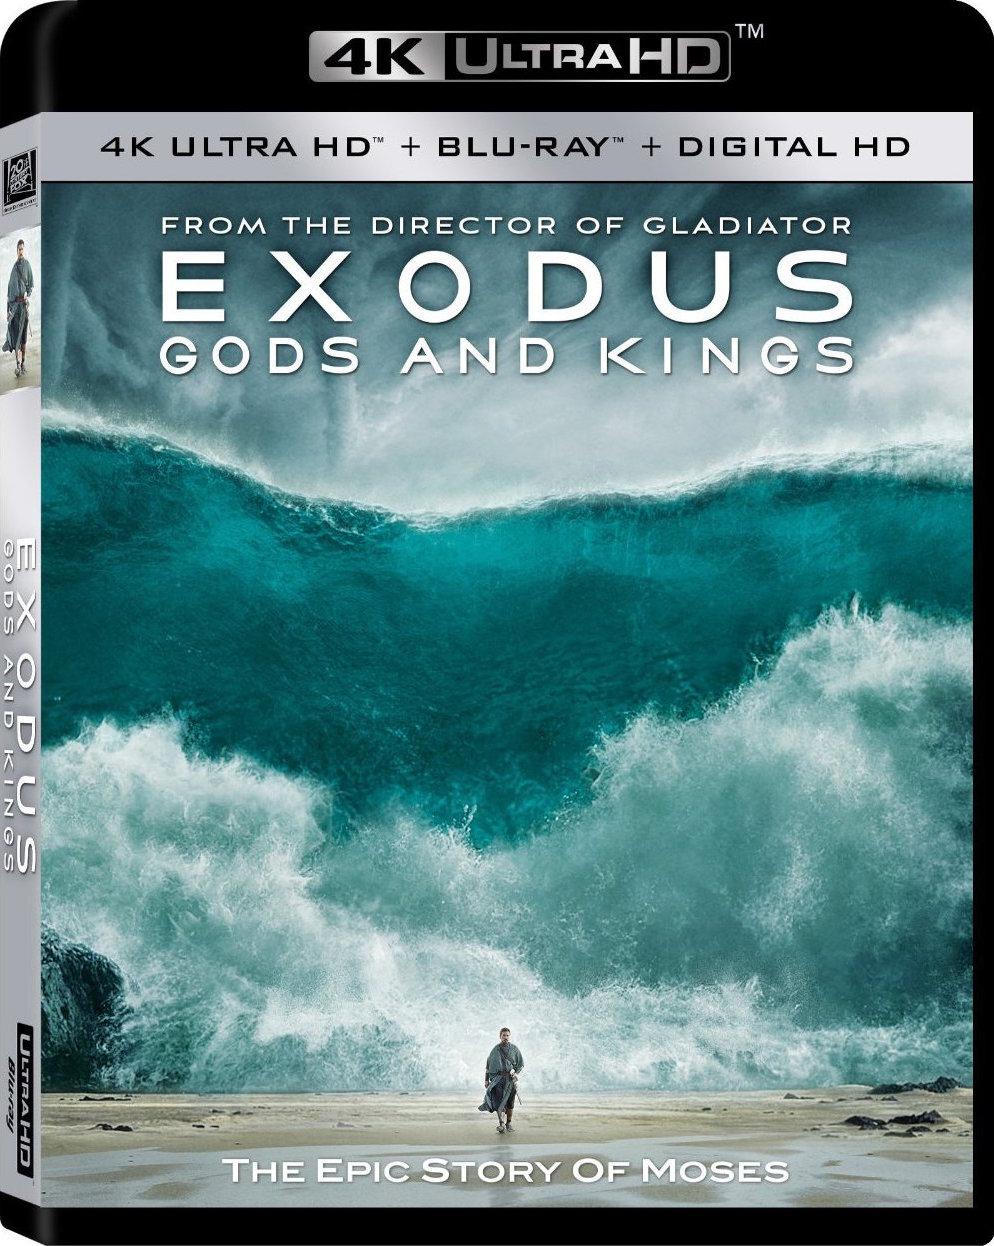 Exodus: Gods and Kings (2014) 4K Ultra HD Blu-ray